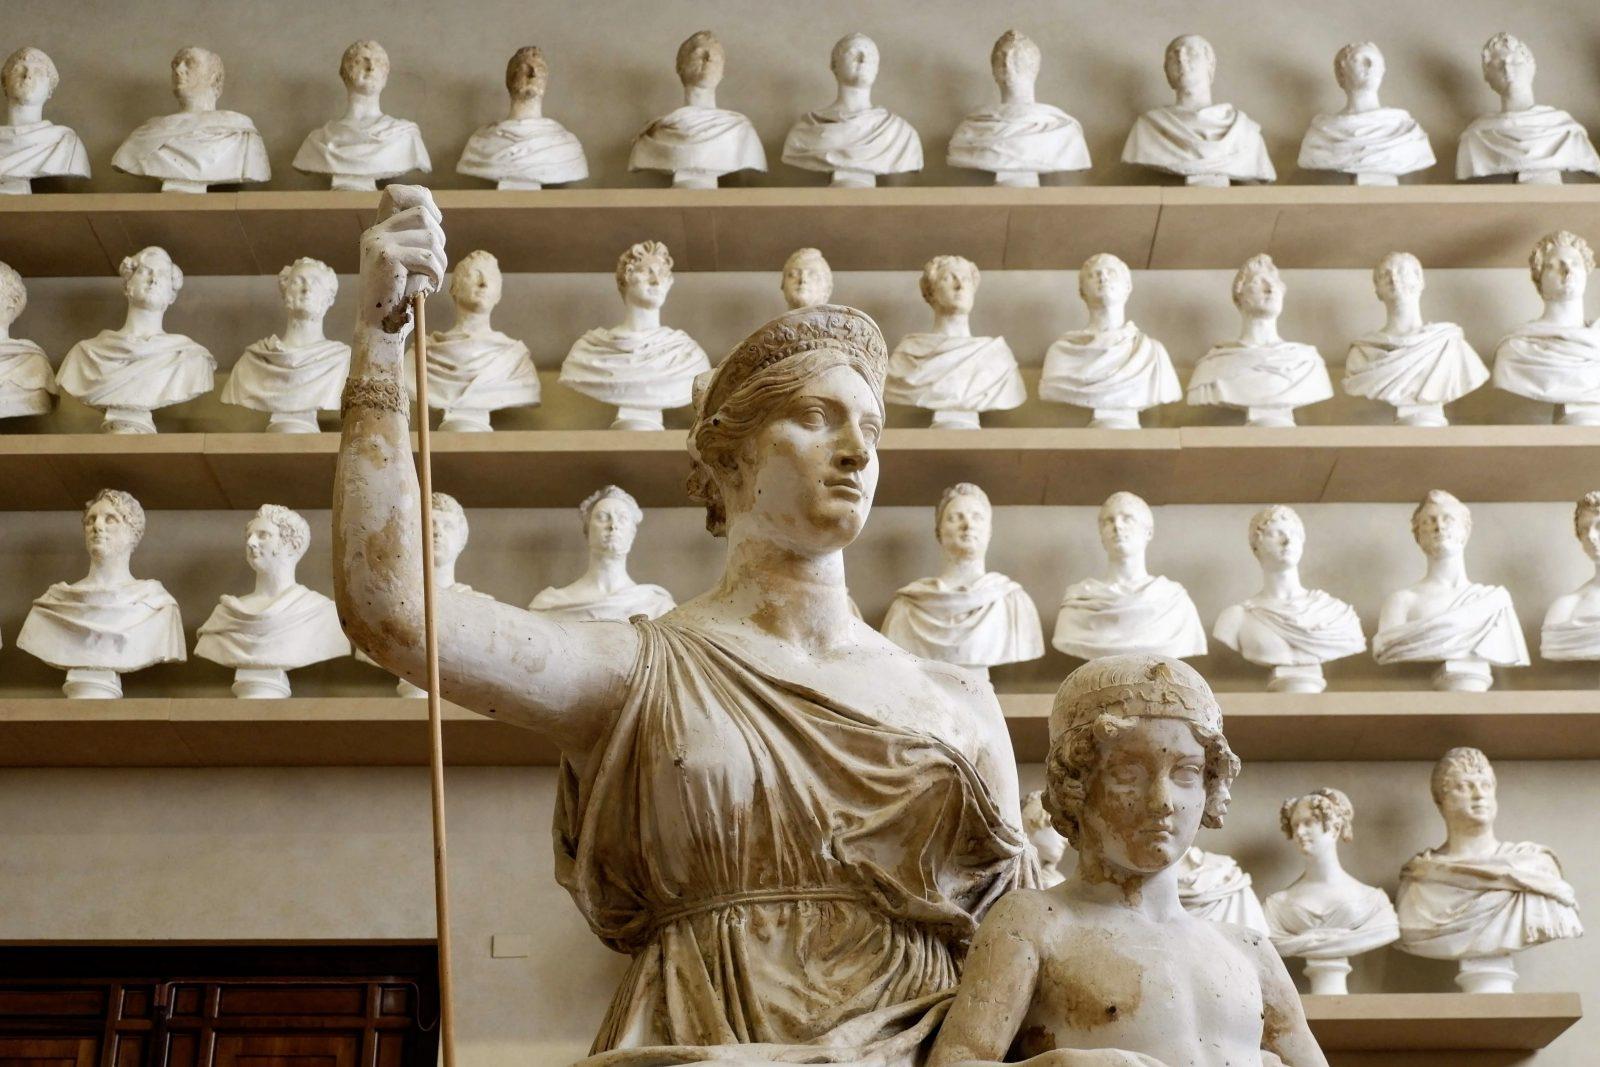 zegqzgiis6o - Metropolitan Museum of Art